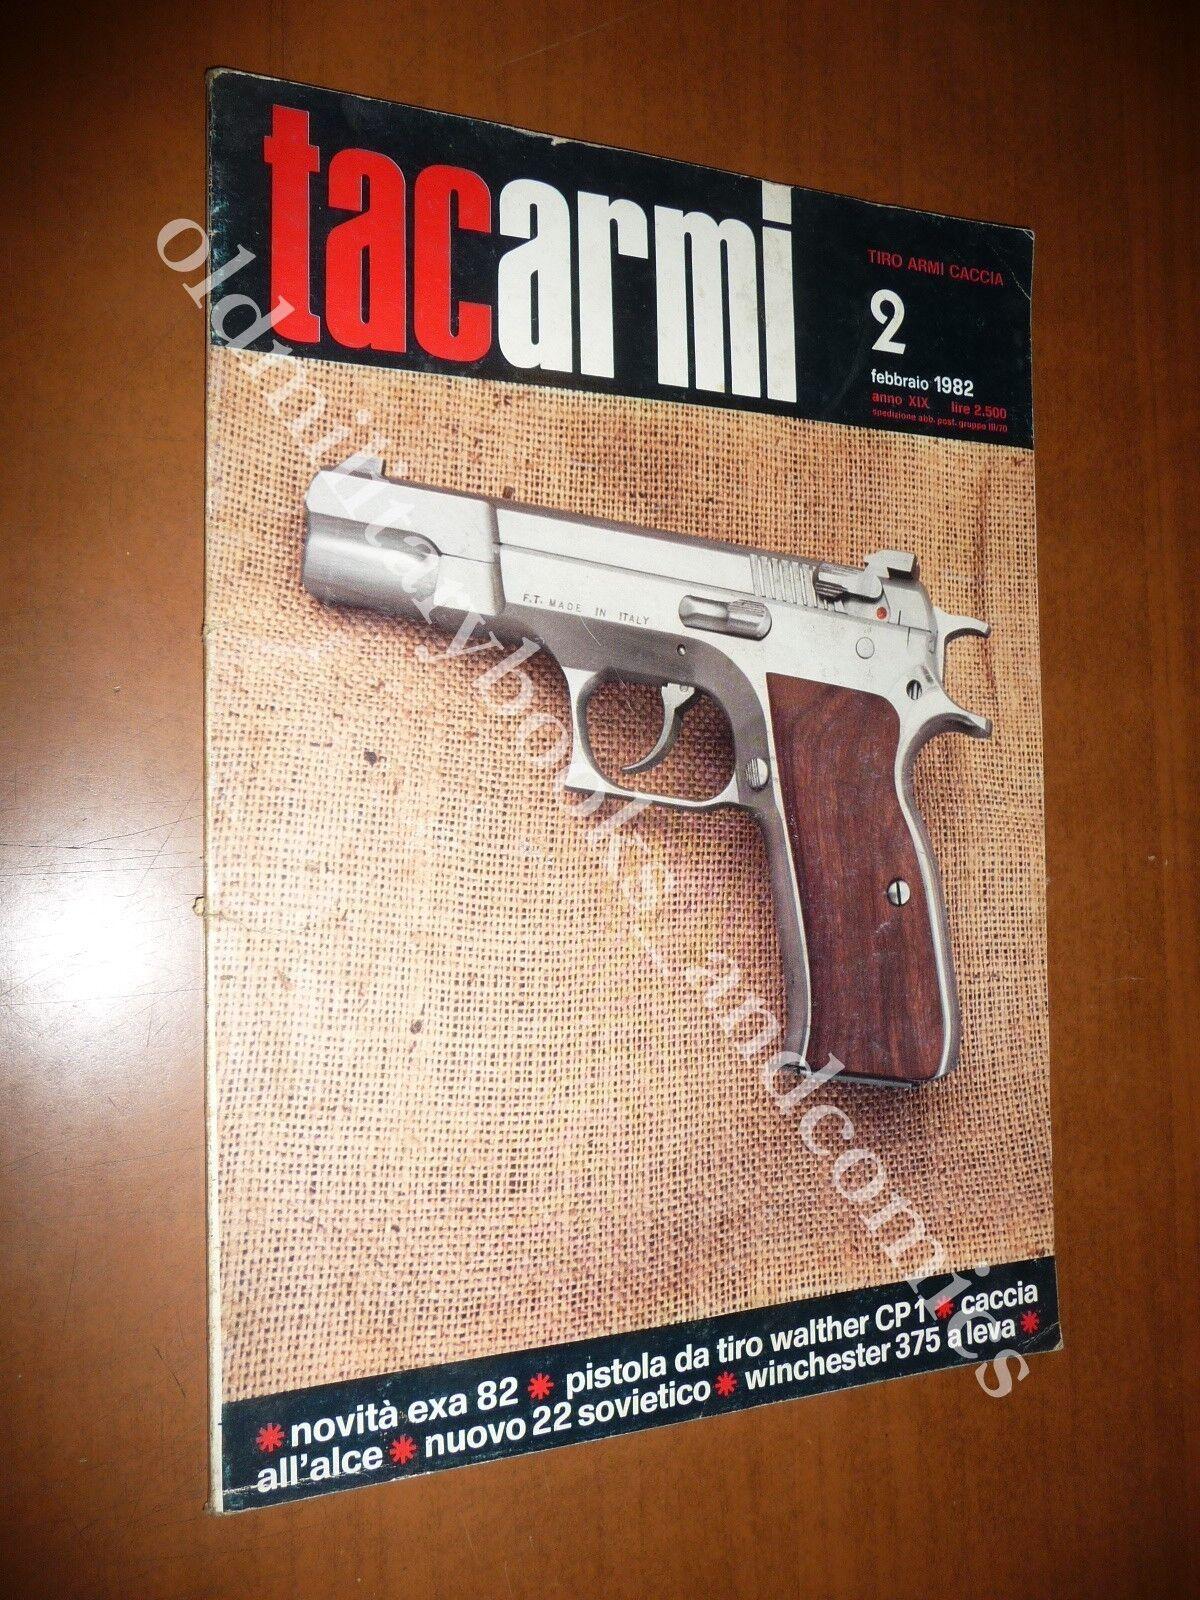 TAC ARMI TACARMI (TIRO ARMI CACCIA) n. 2 FEBBRAIO 1982 PISTOLE FUCILI REVOLVER